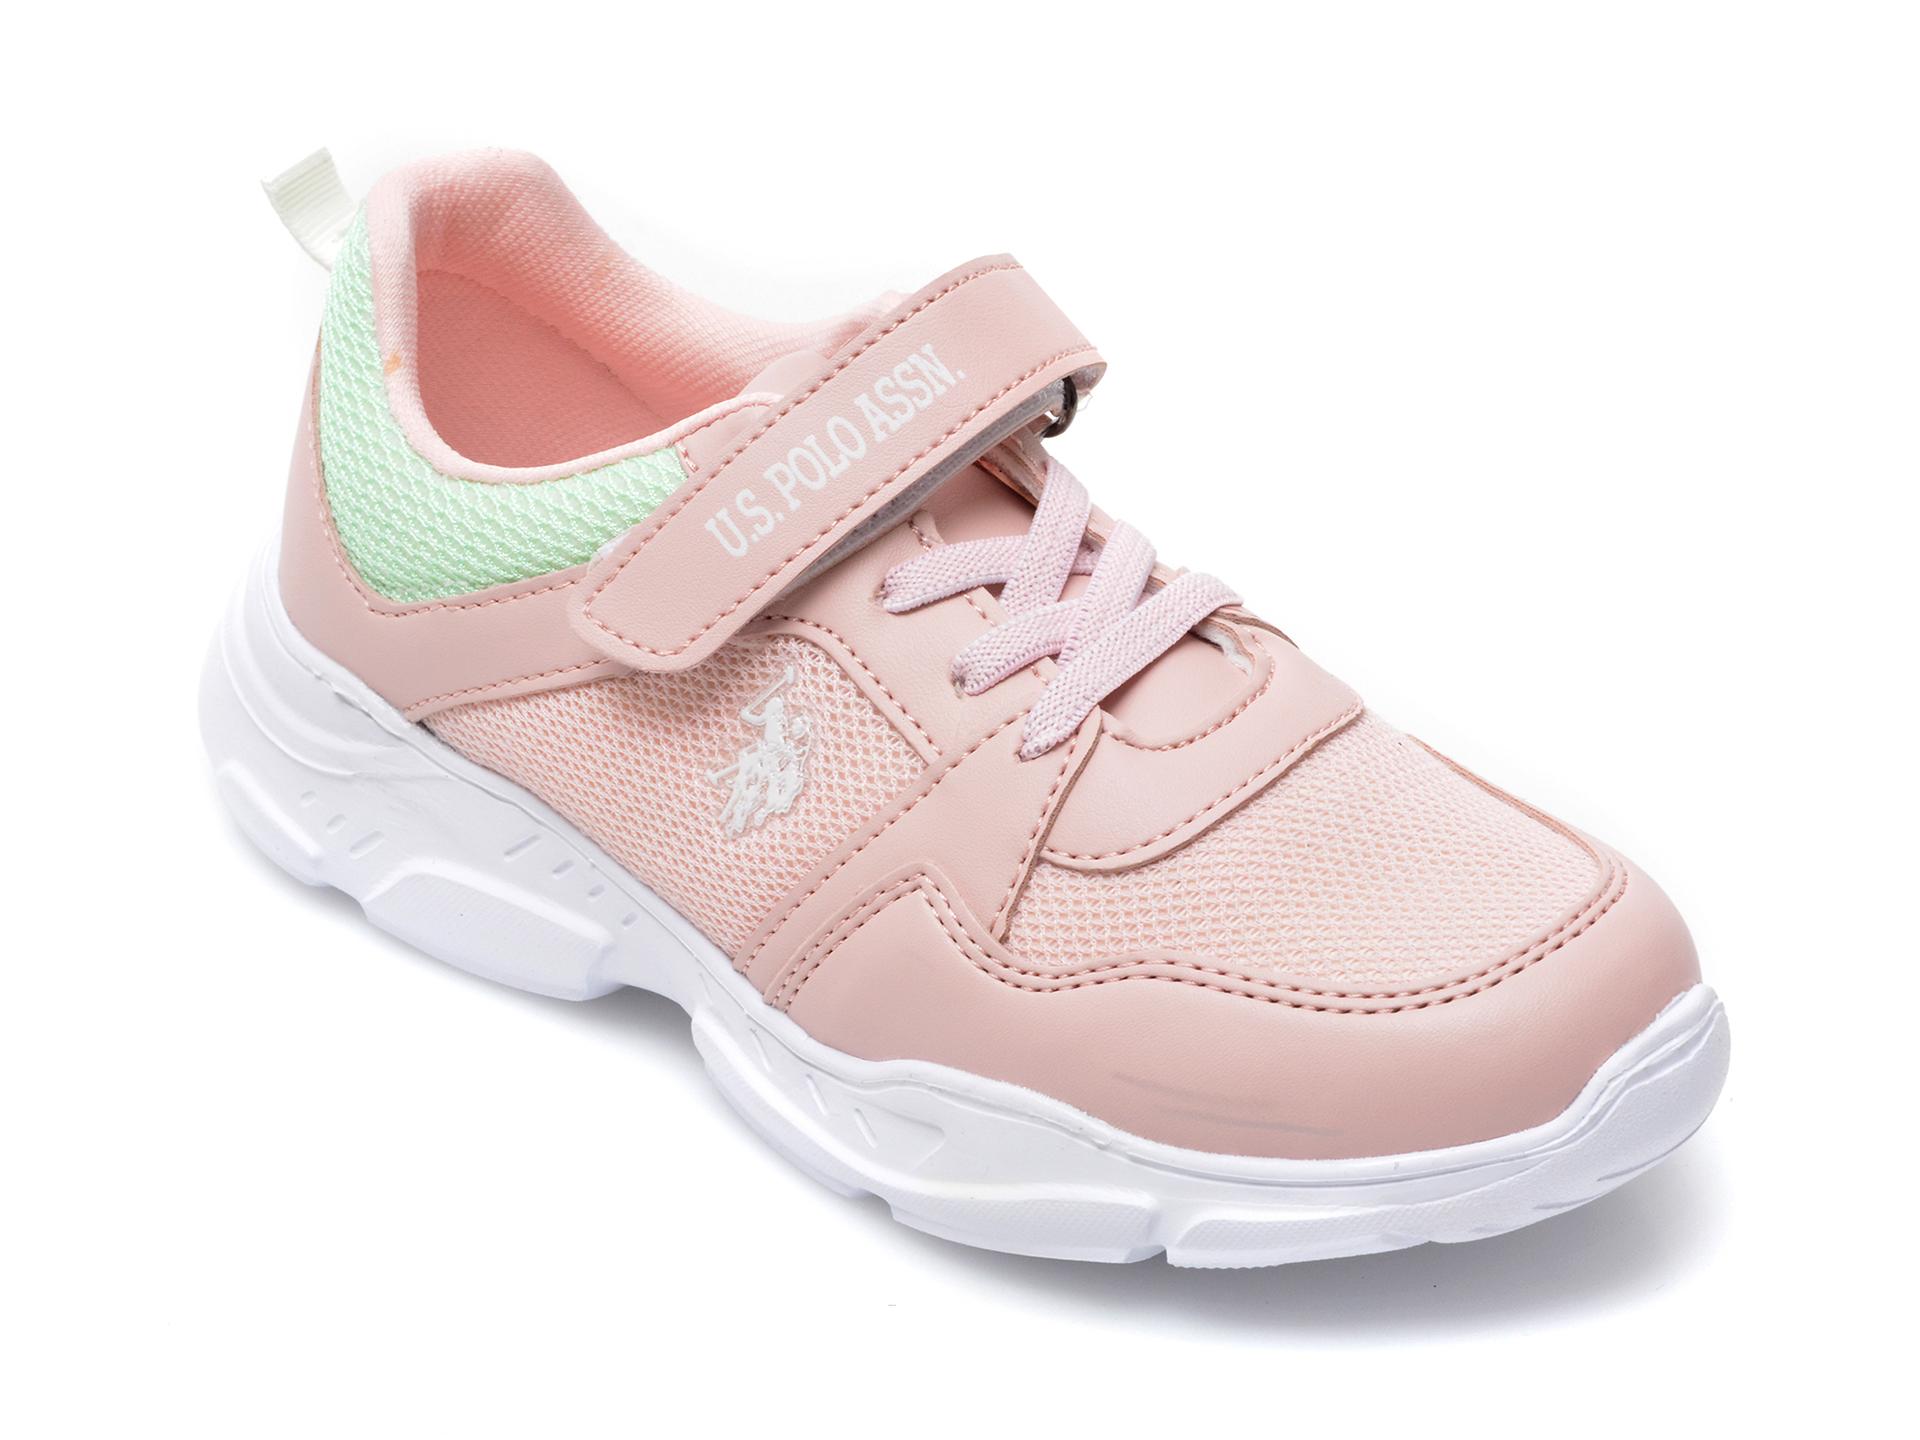 Pantofi sport US POLO ASSN roz, RECE1FX, din material textil si piele ecologica